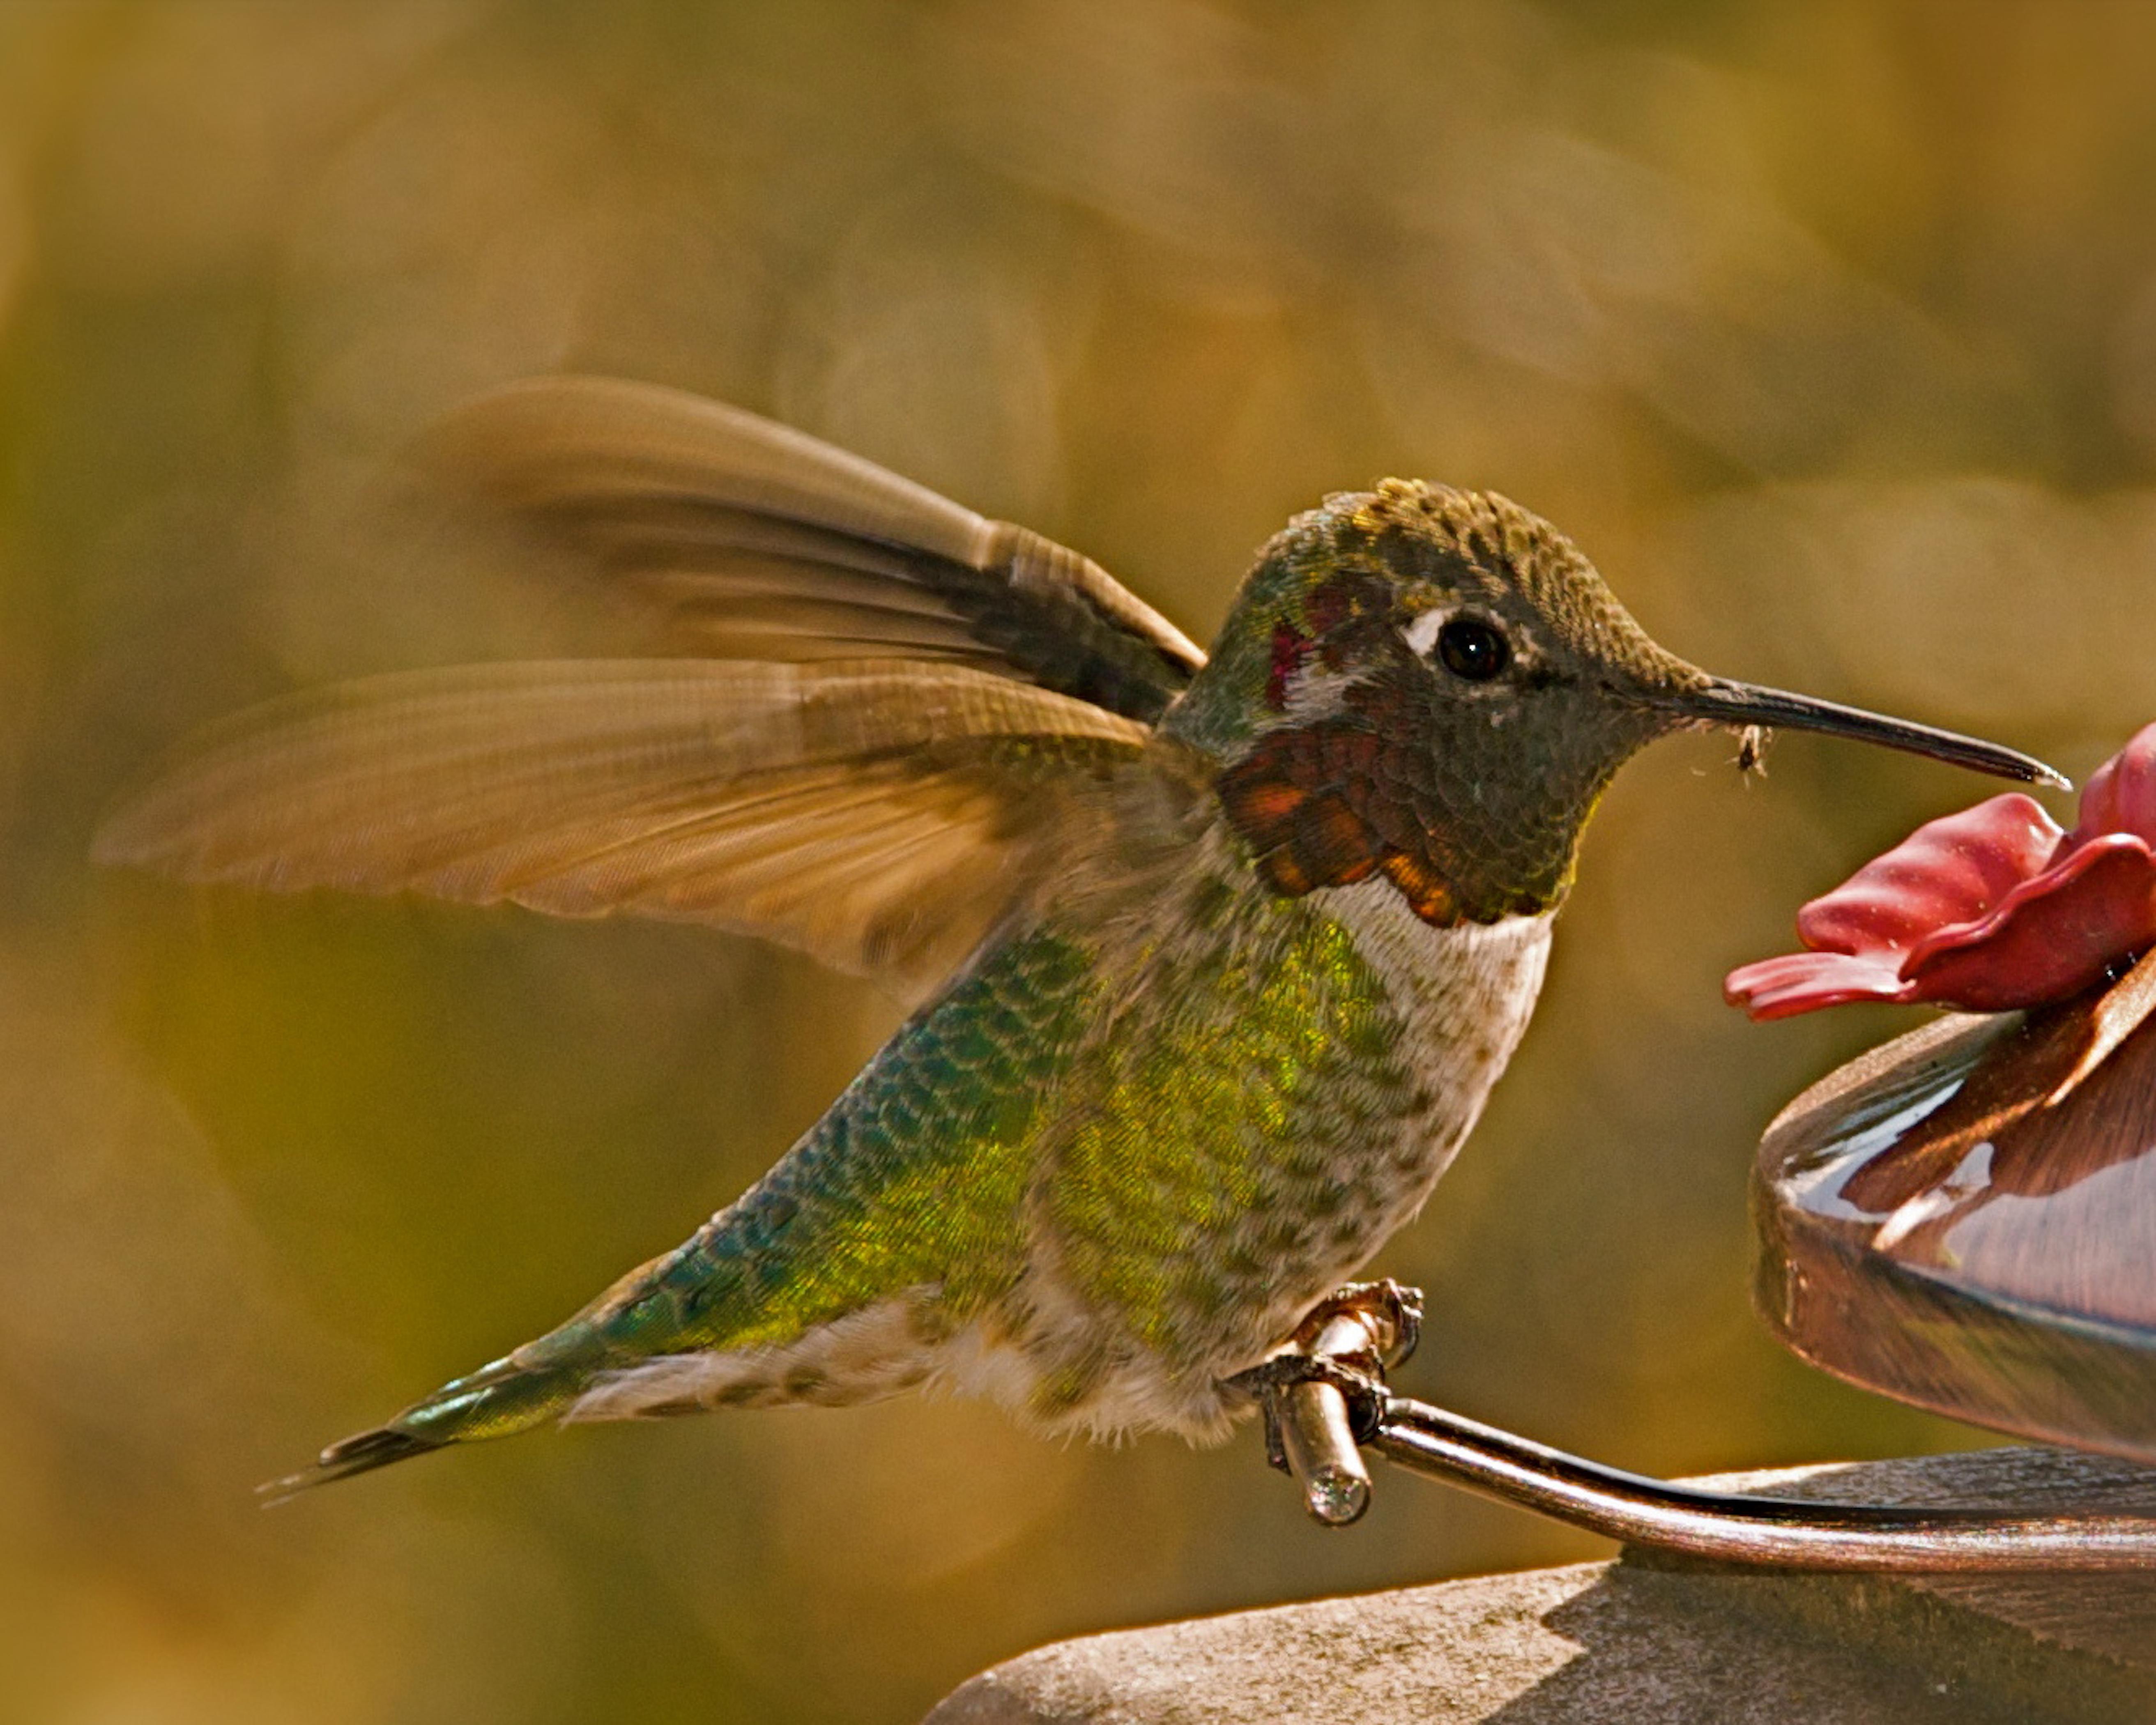 BQ Hummingbird with Spider (1.1MB)